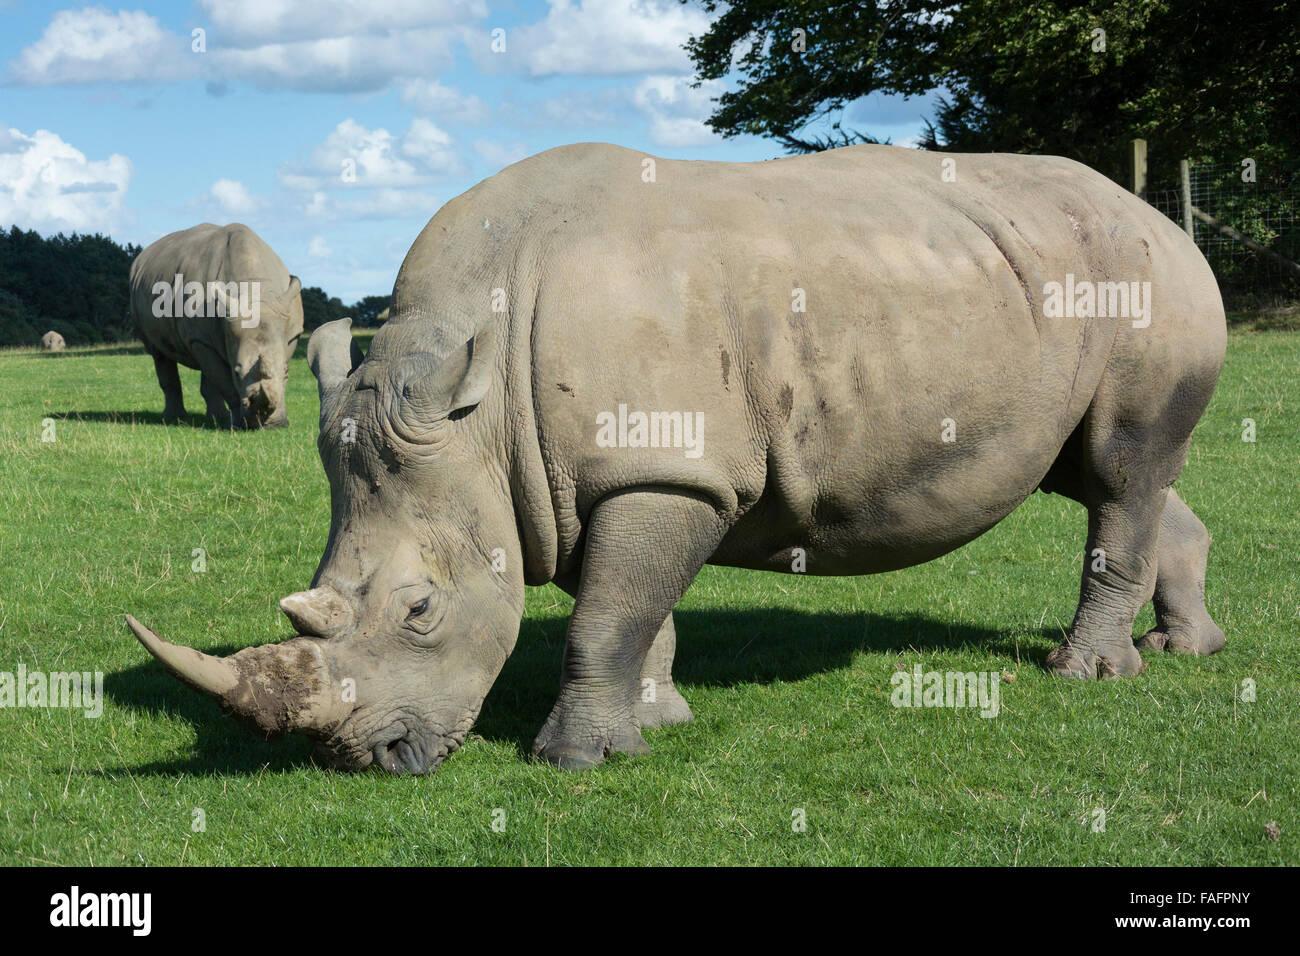 White Rhinoceros roaming in pastures at Knowsley Safari Park, Merseyside, UK. - Stock Image